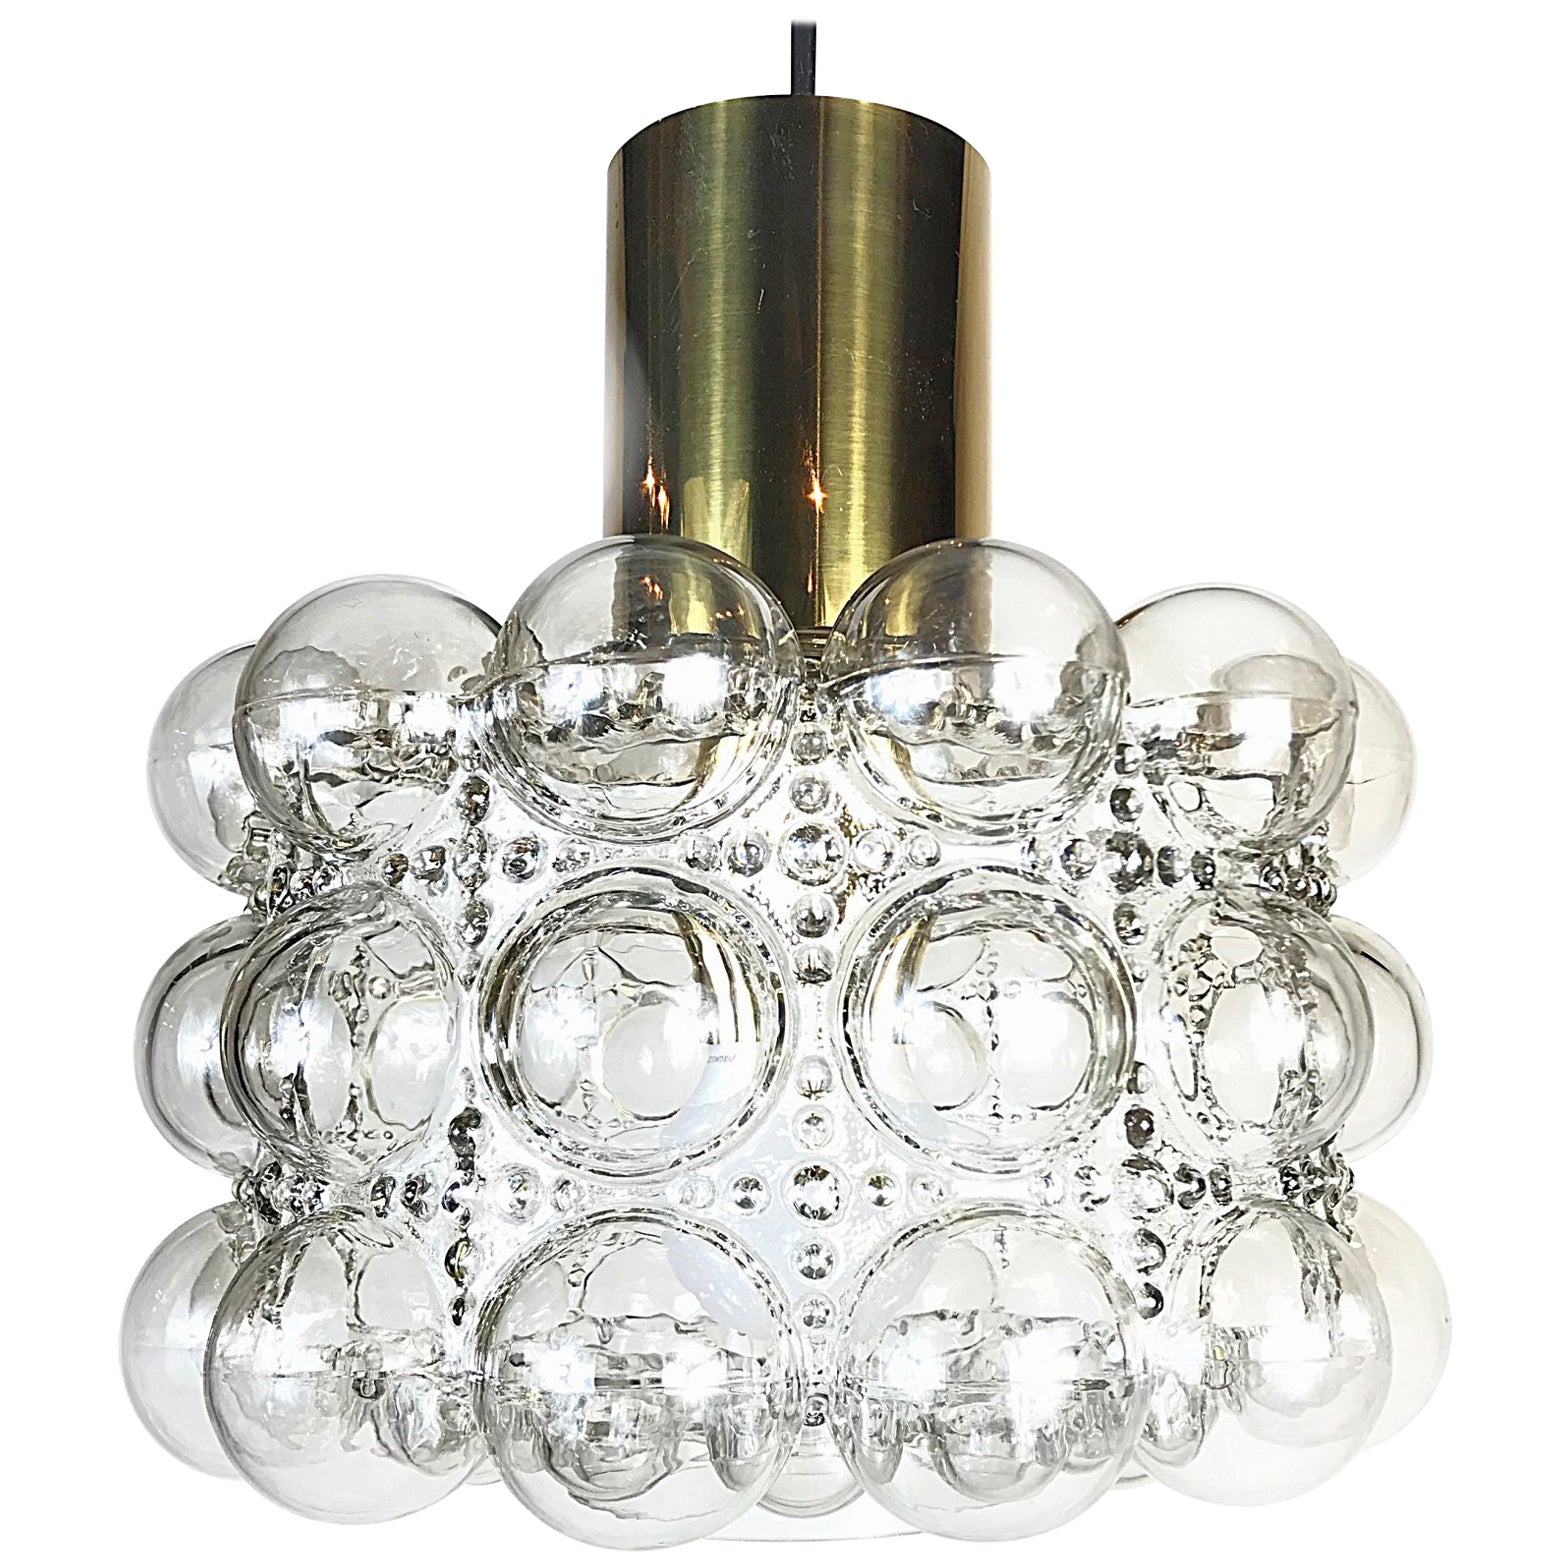 Space age helena tynell glashütte limburg bubble pendant light 1960s germany